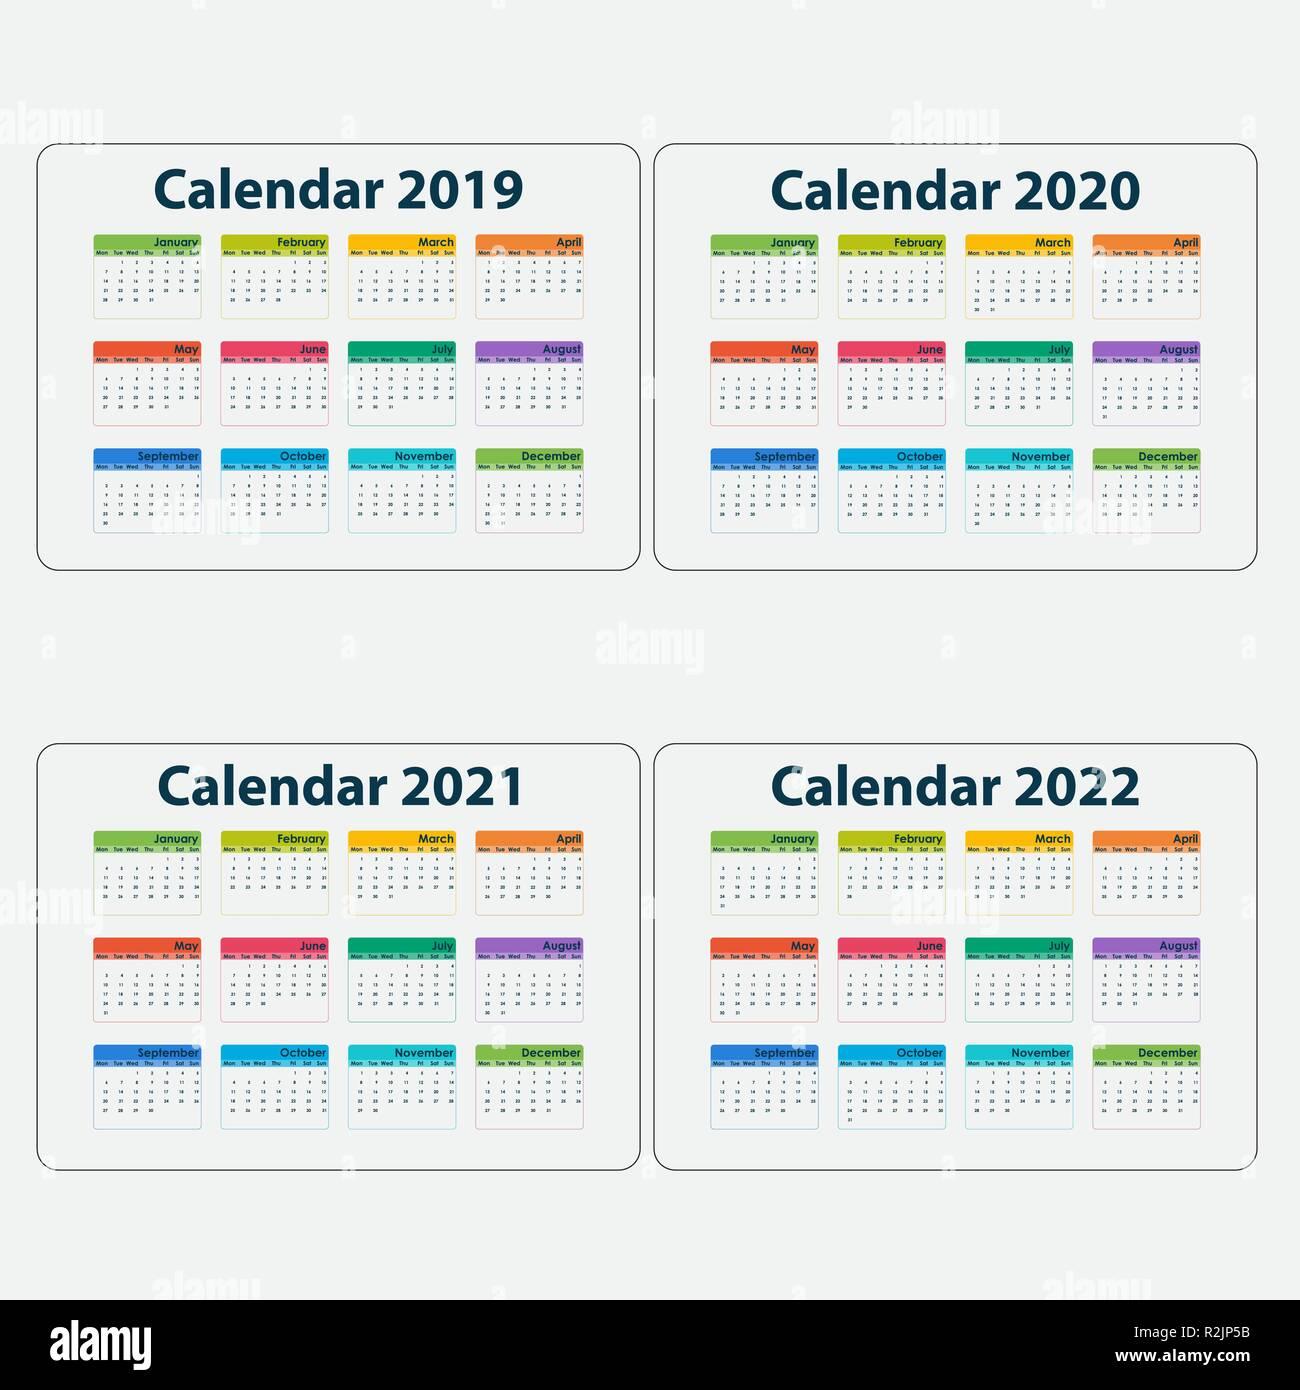 Calendrier 2021 Avec Semaine.Calendrier 2019 Calendrier 2020 Calendrier 2021 Et 2022